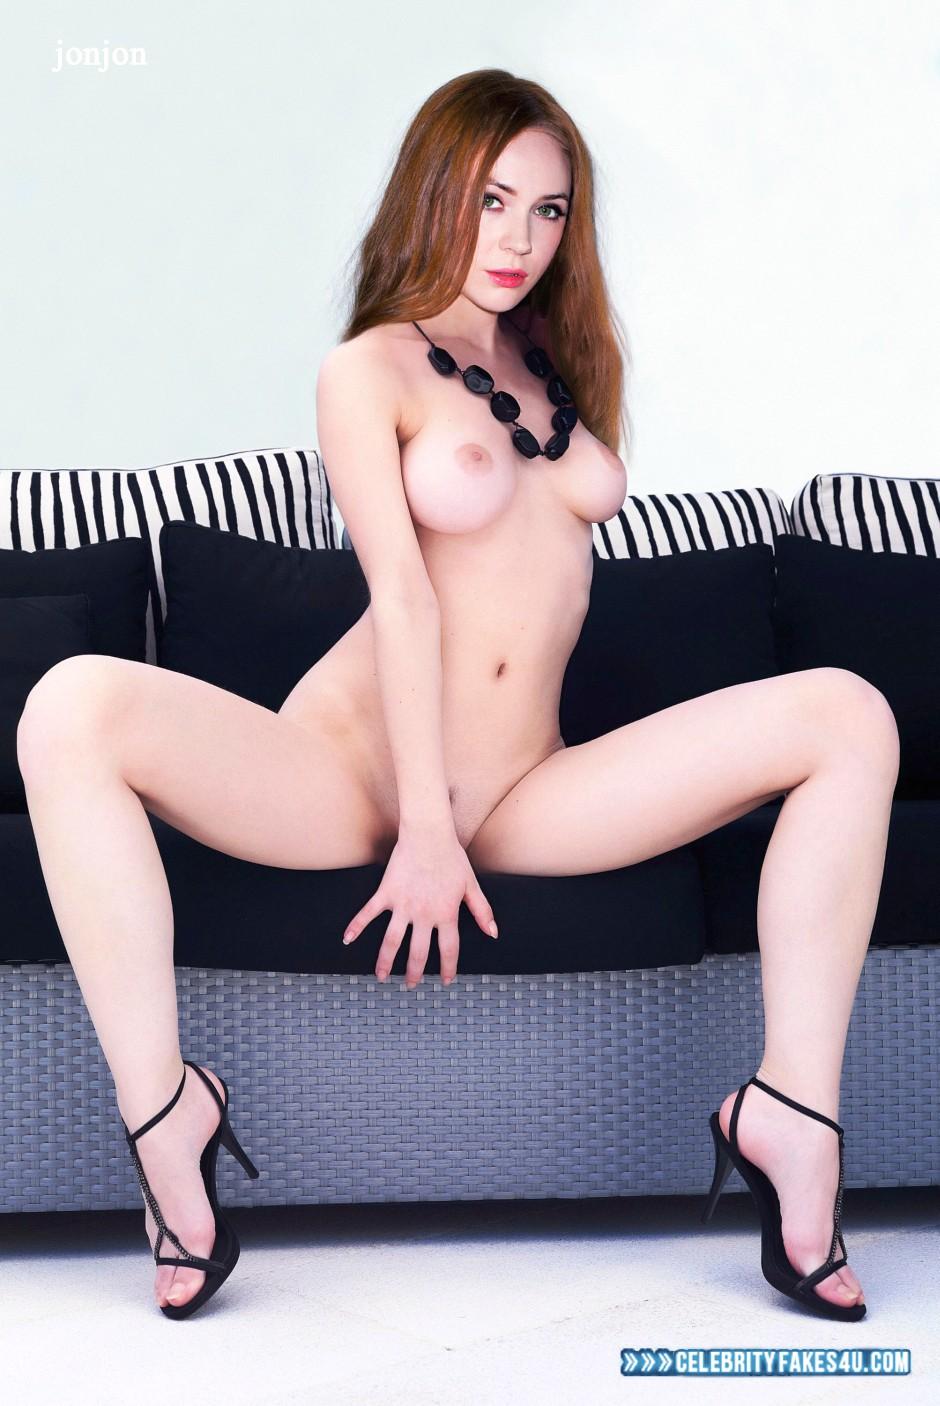 Karen Gillan Legs Hot Tits Fake 001 « CelebrityFakes4u.com